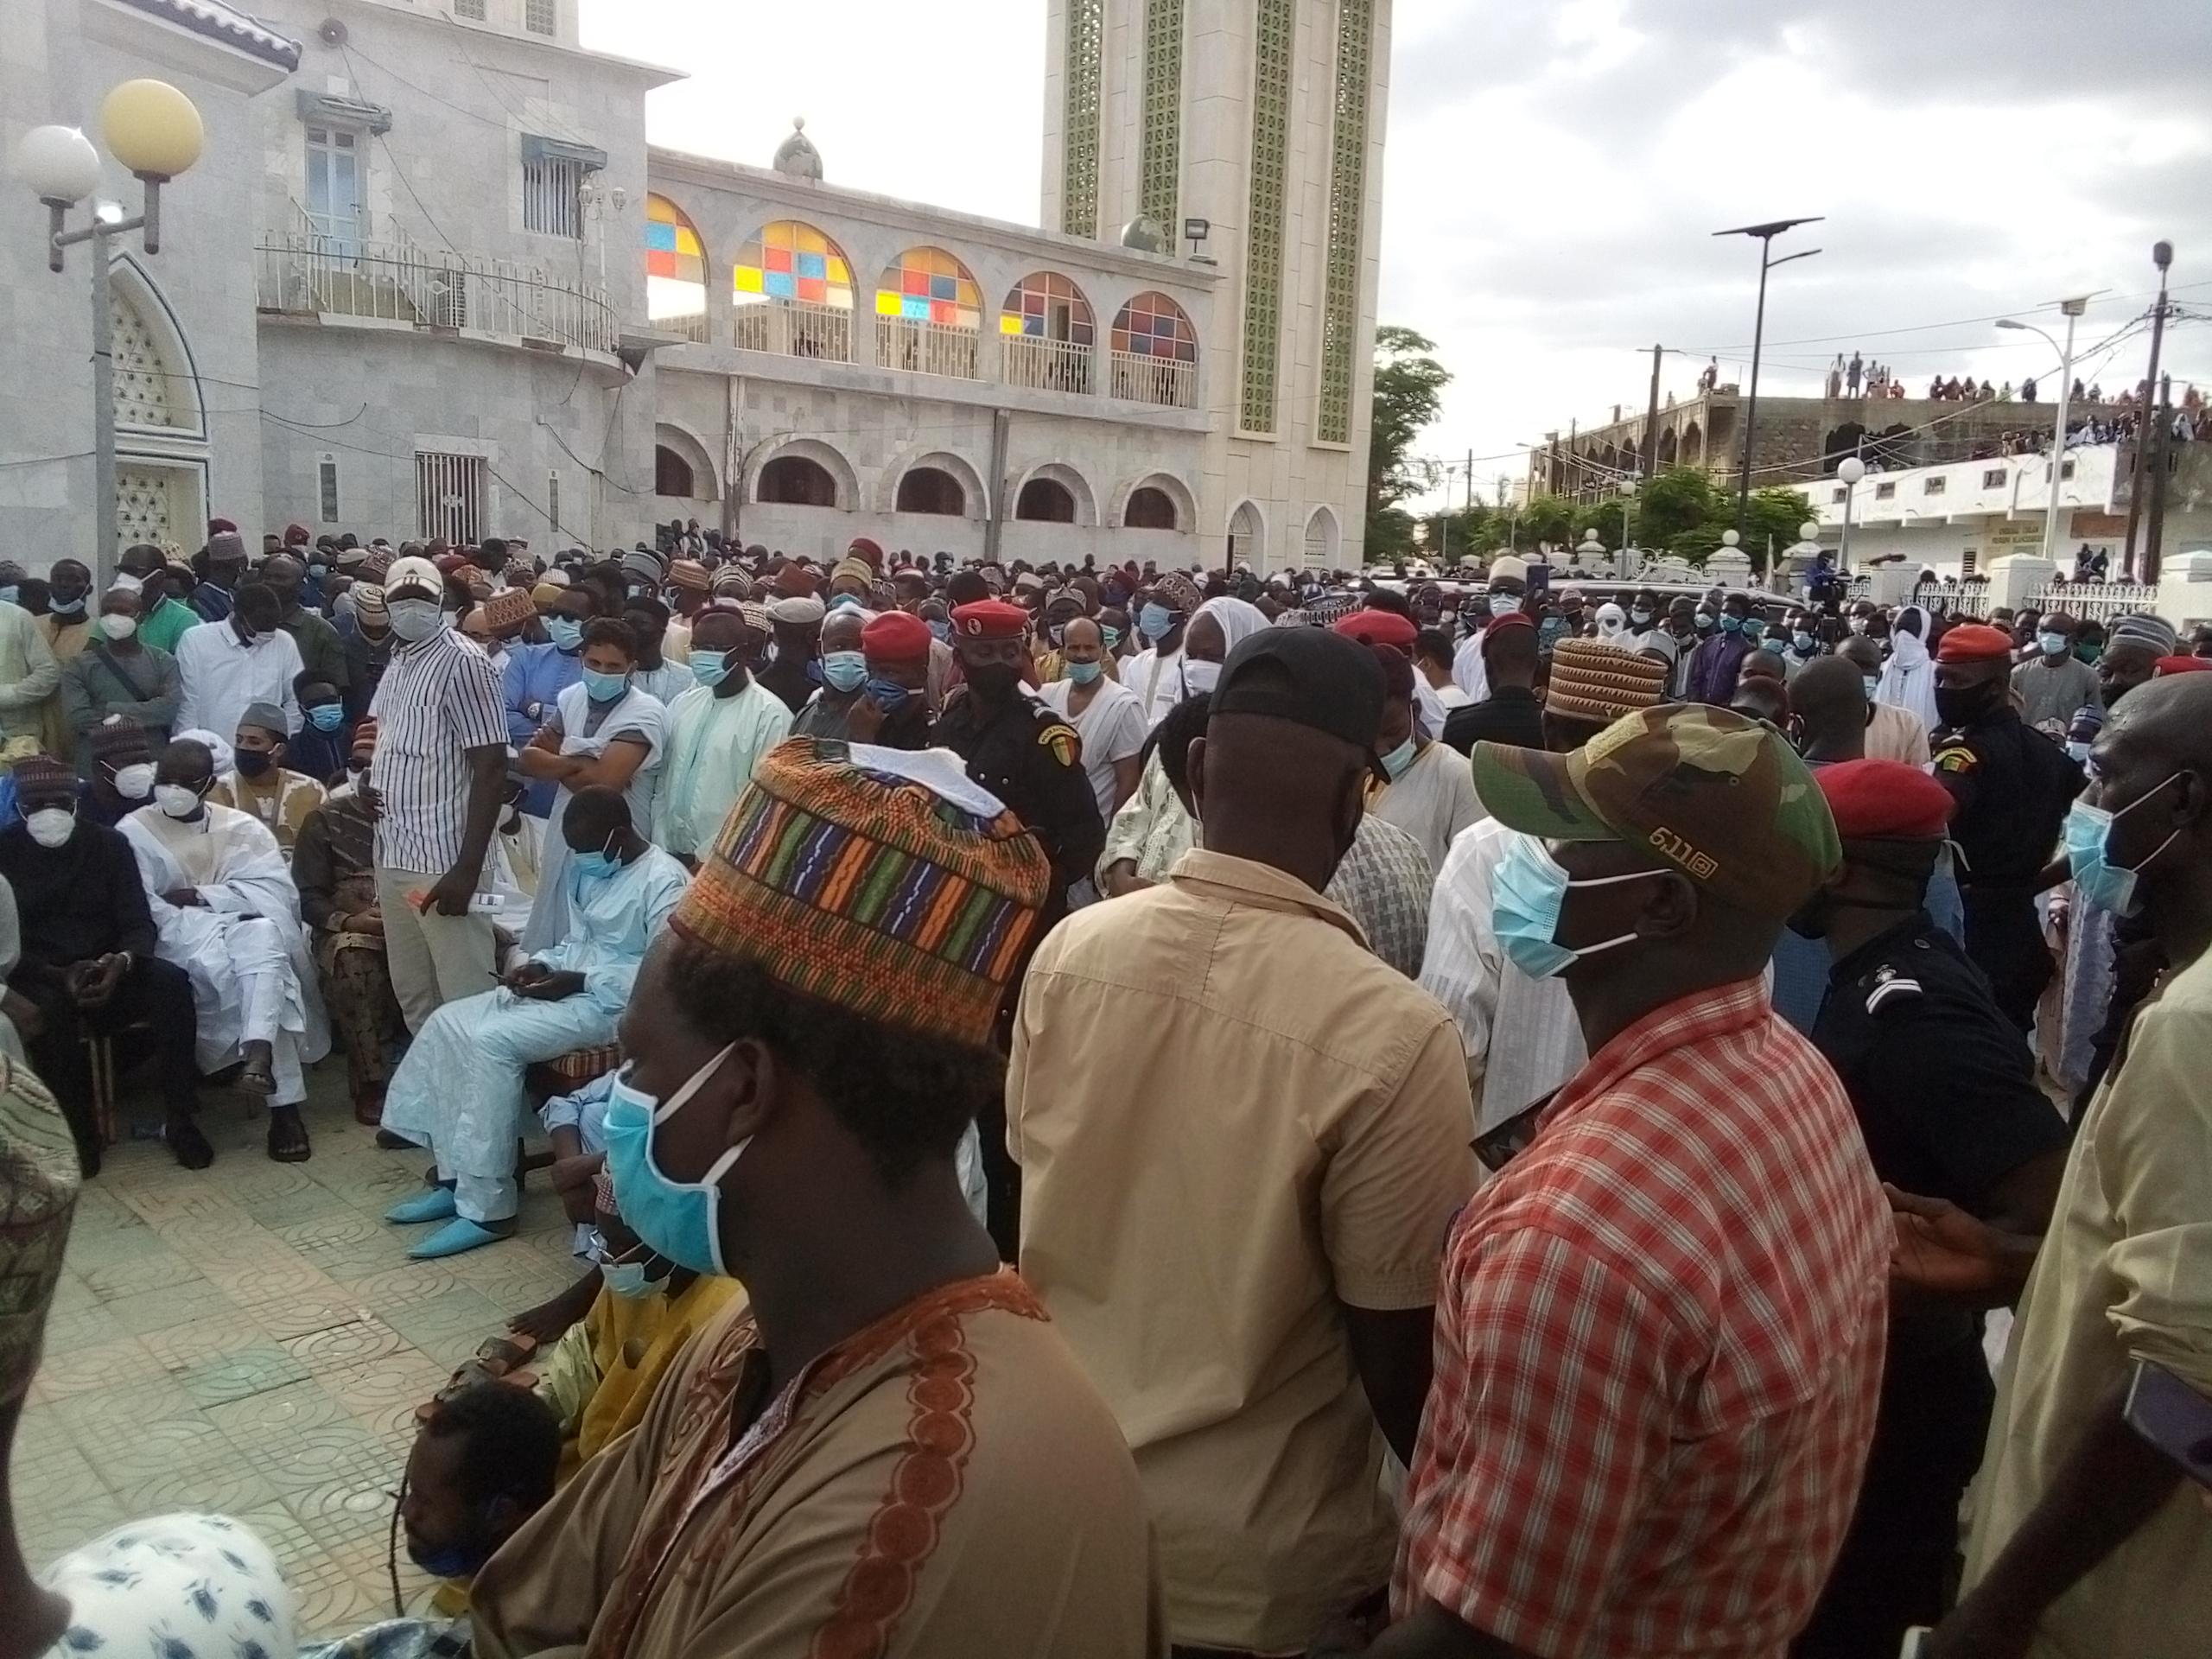 Médina Baye : Inhumation de Cheikh Mouhammadou Moctar Ibrahima Niass auprès de son père Cheikh Al Islam. (Images)